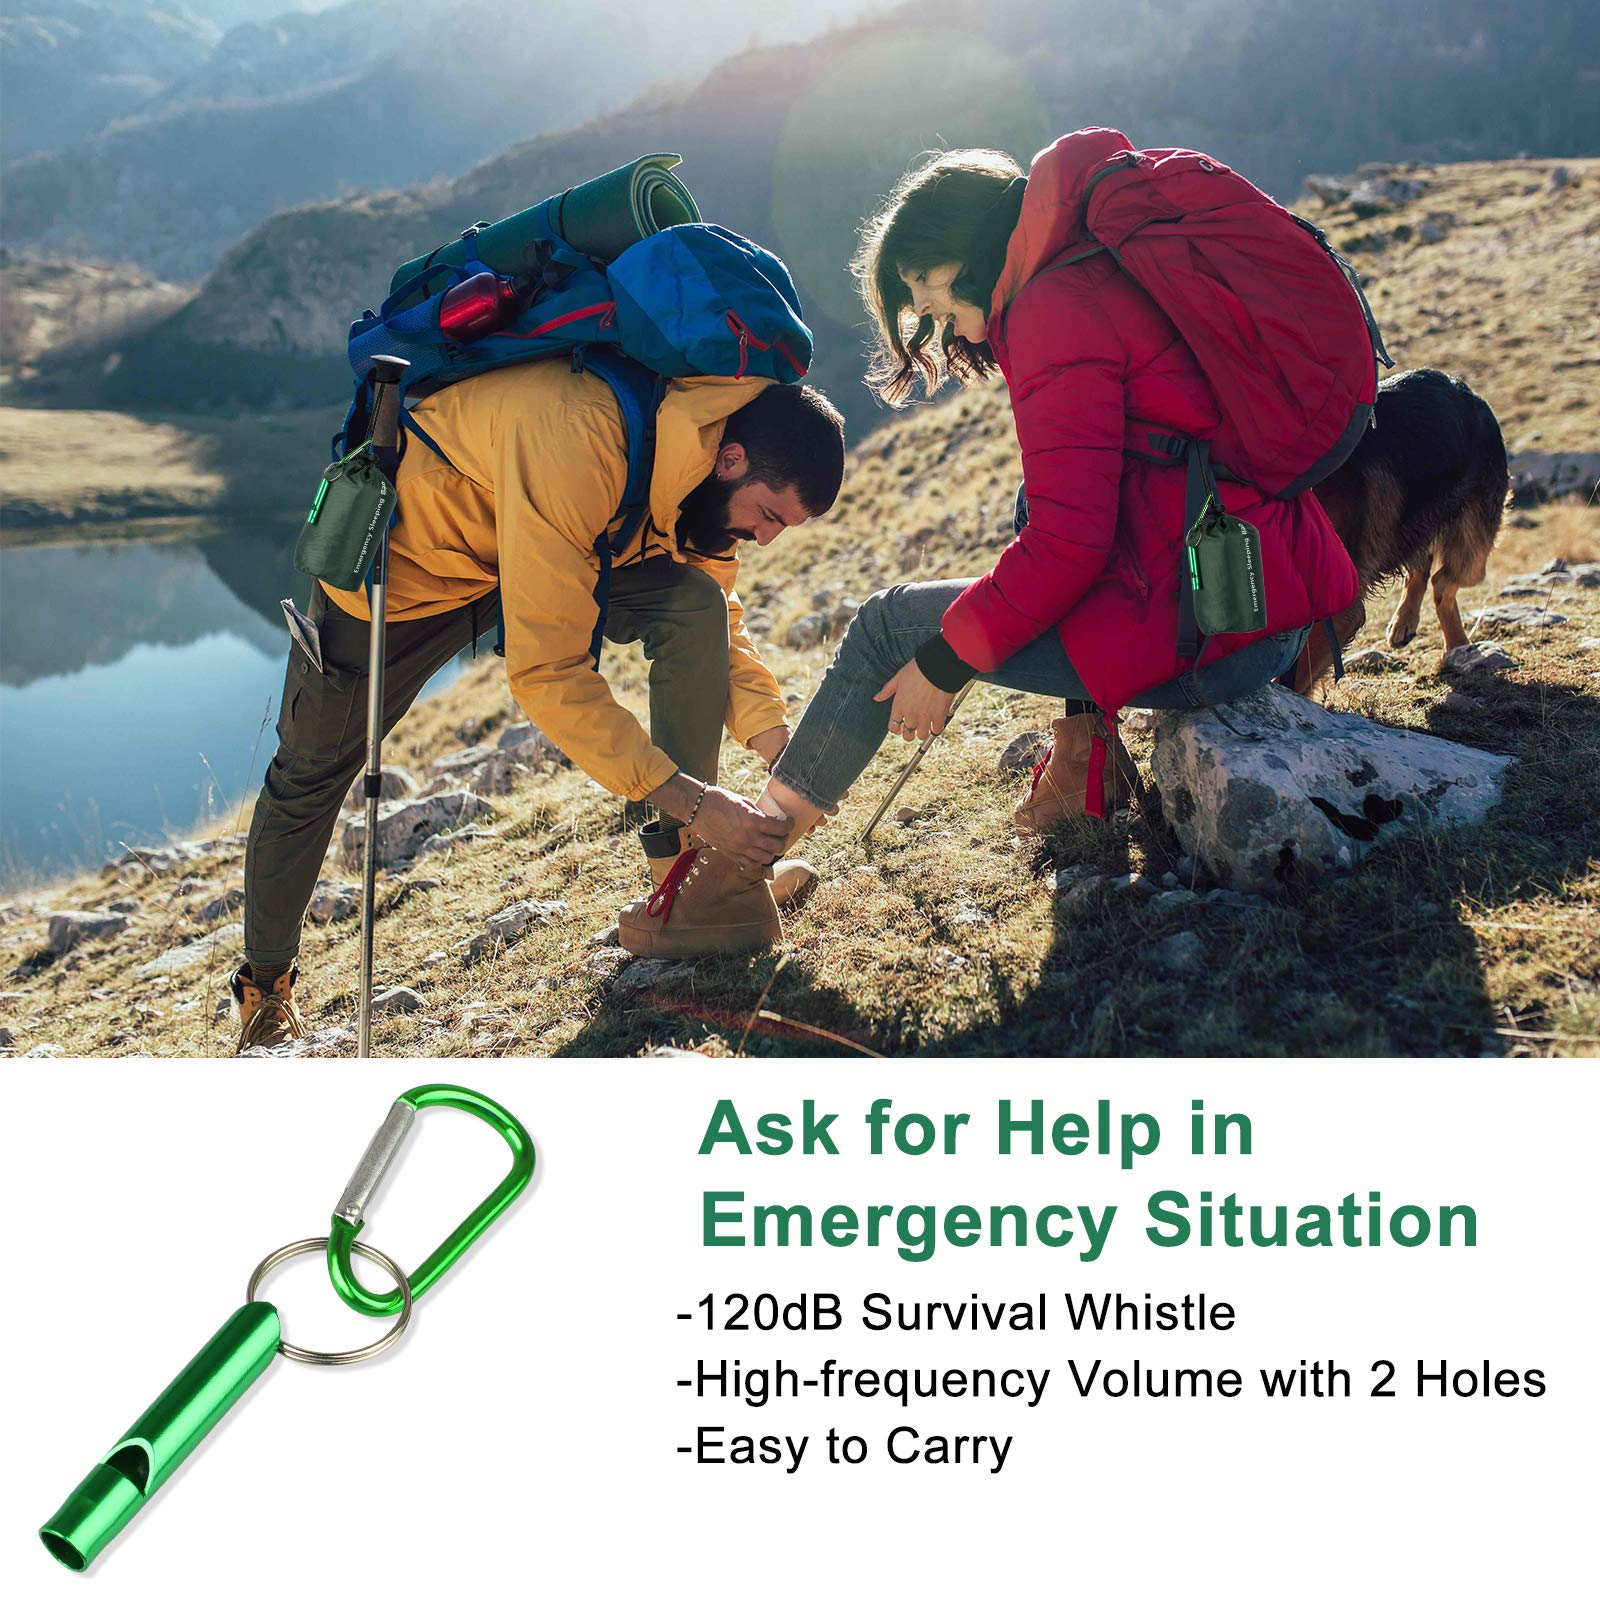 EEEKit Emergency Sleeping Bag with Survival Whistle,2Pack Lightweight Waterproof Survival Bivy Sack, Thermal Emergency Blankets Portable Mylar Survival Gear for Camping, Hiking, Outdoor Activities